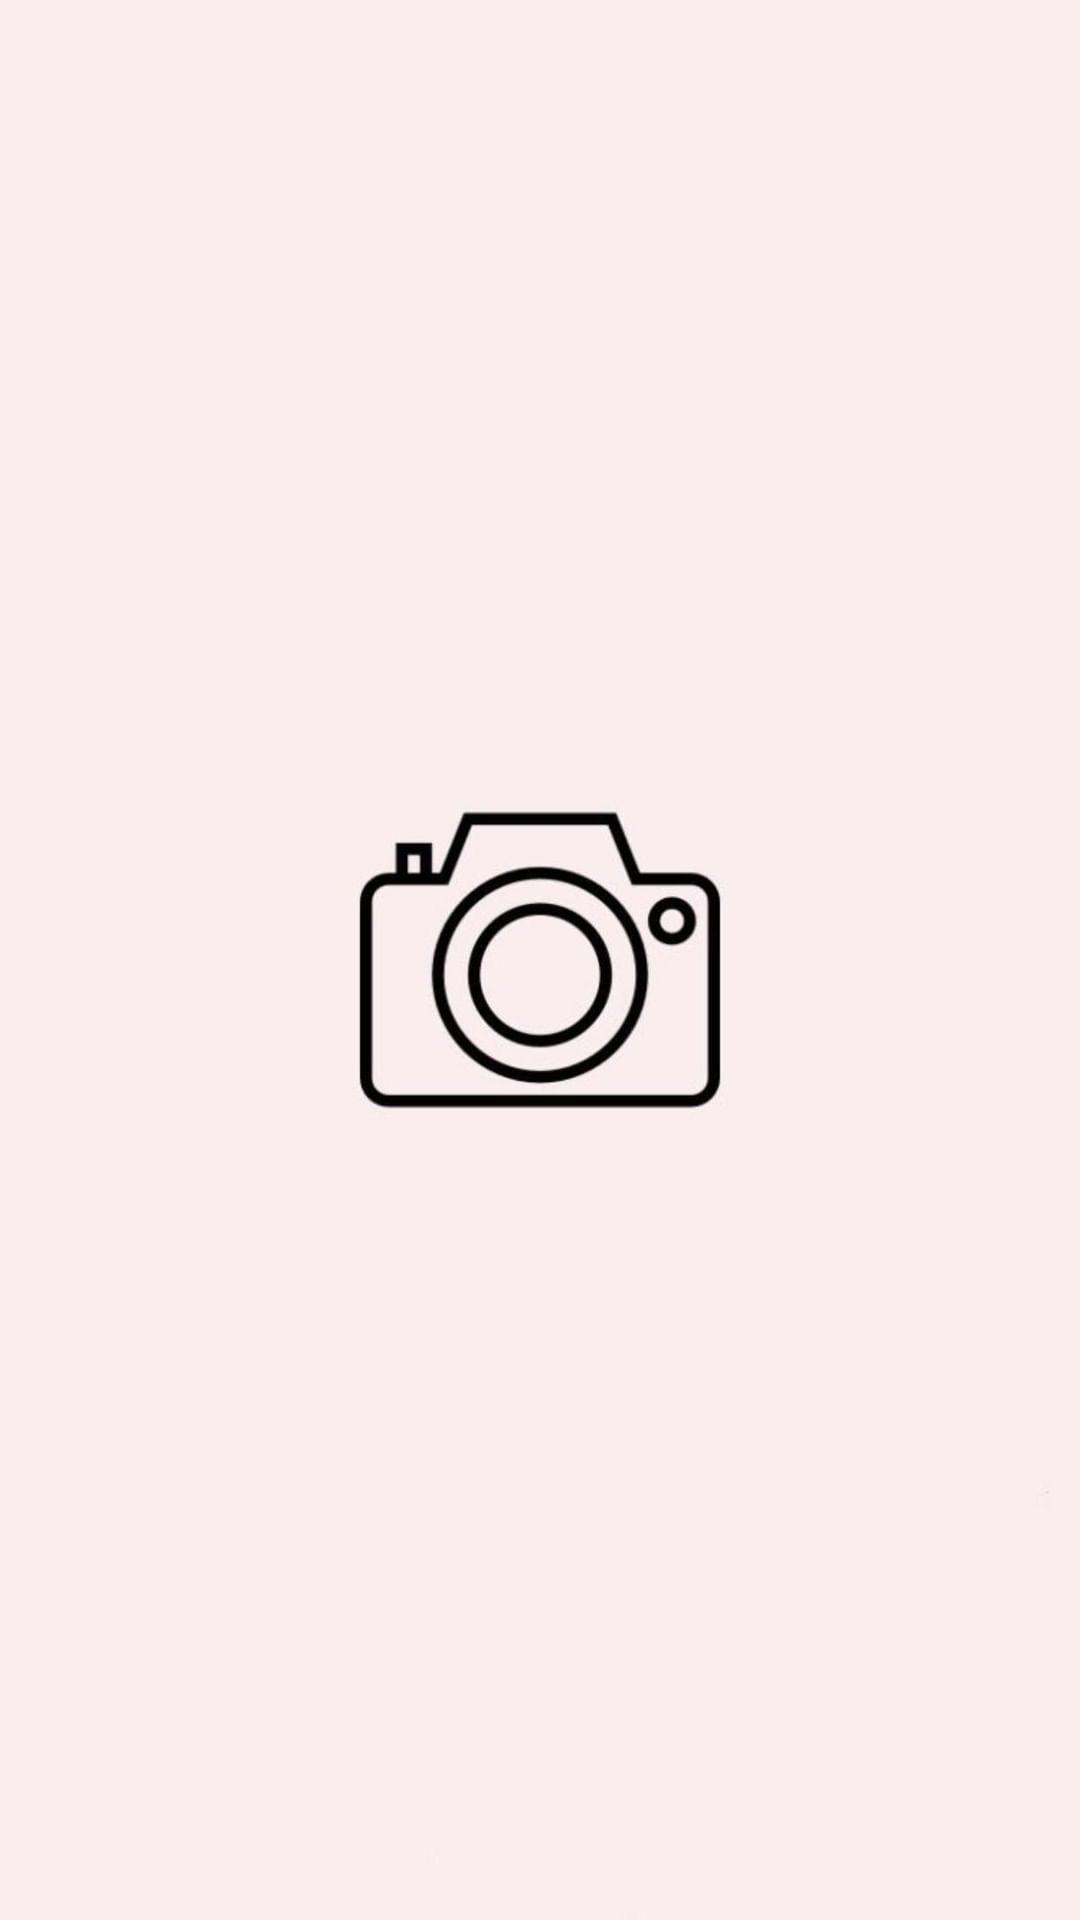 Pin by Haimavisrur on Mriror | Instagram highlight icons